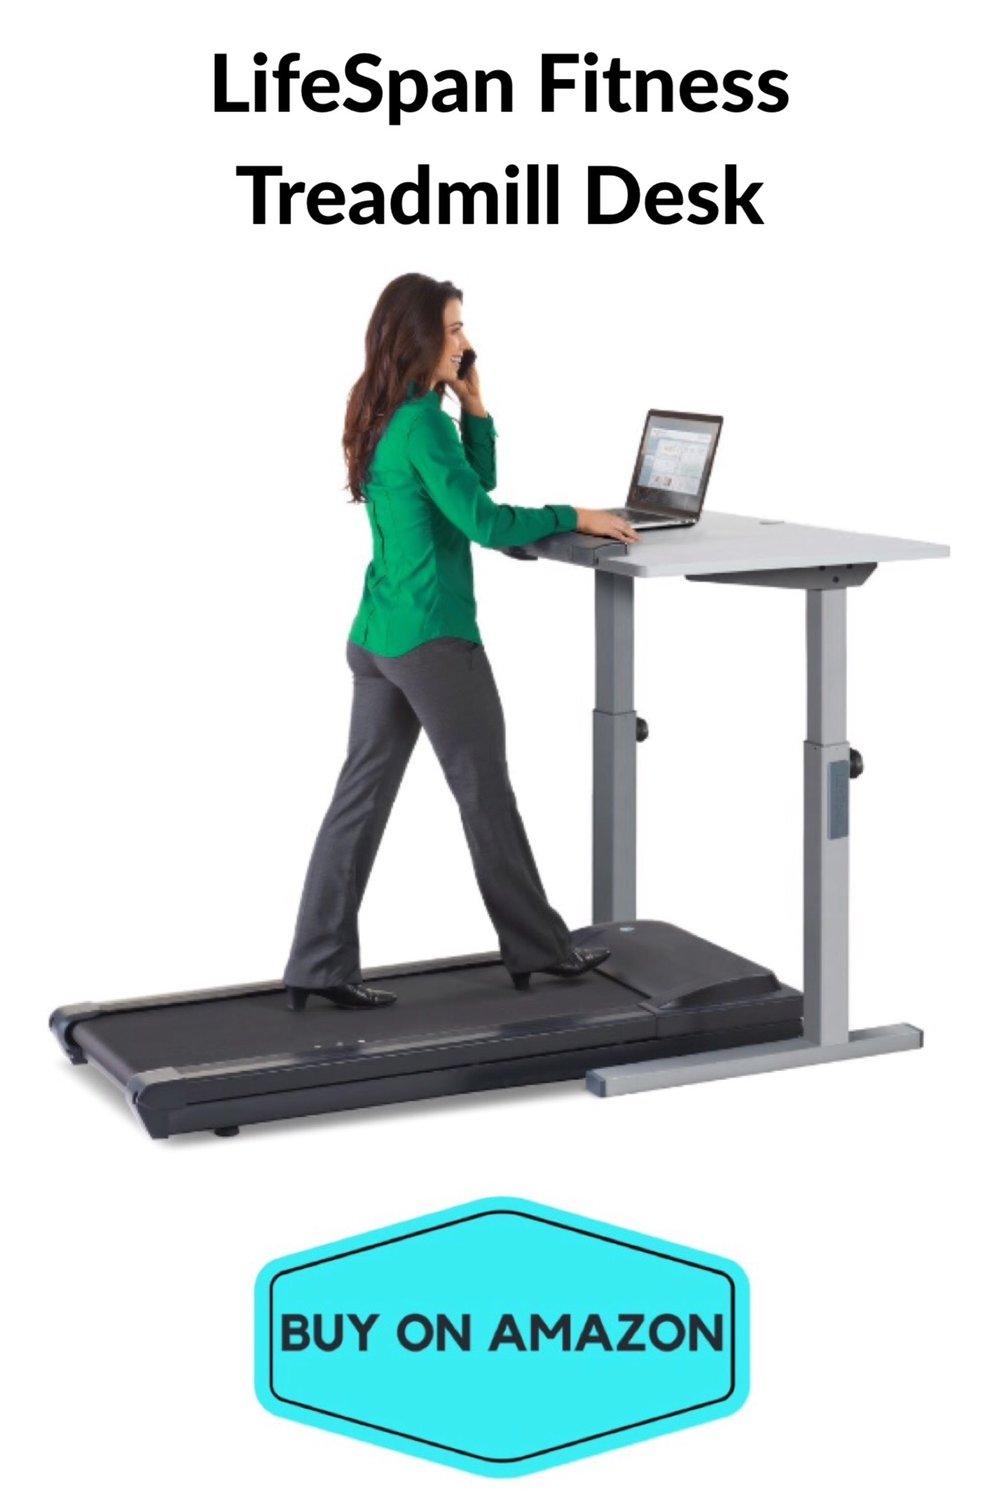 LifeSpan Fitness Treadmill Desk